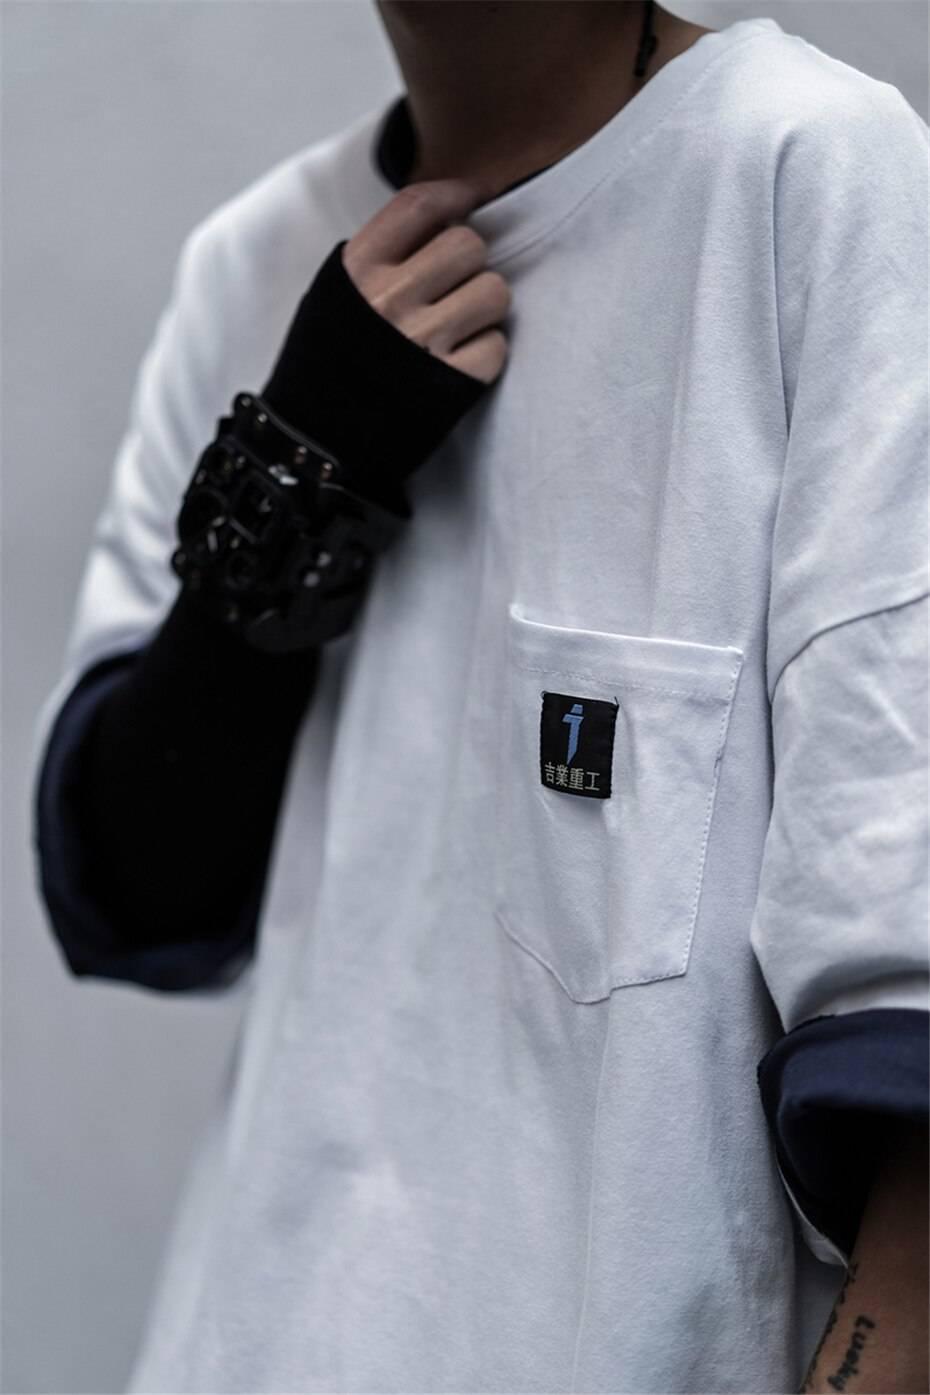 11 BYBB'S DARK Summer Oversize T-shirts Men Streetwear Casual Short Sleeve Tops Tees Cotton Tshirt Loose WB121